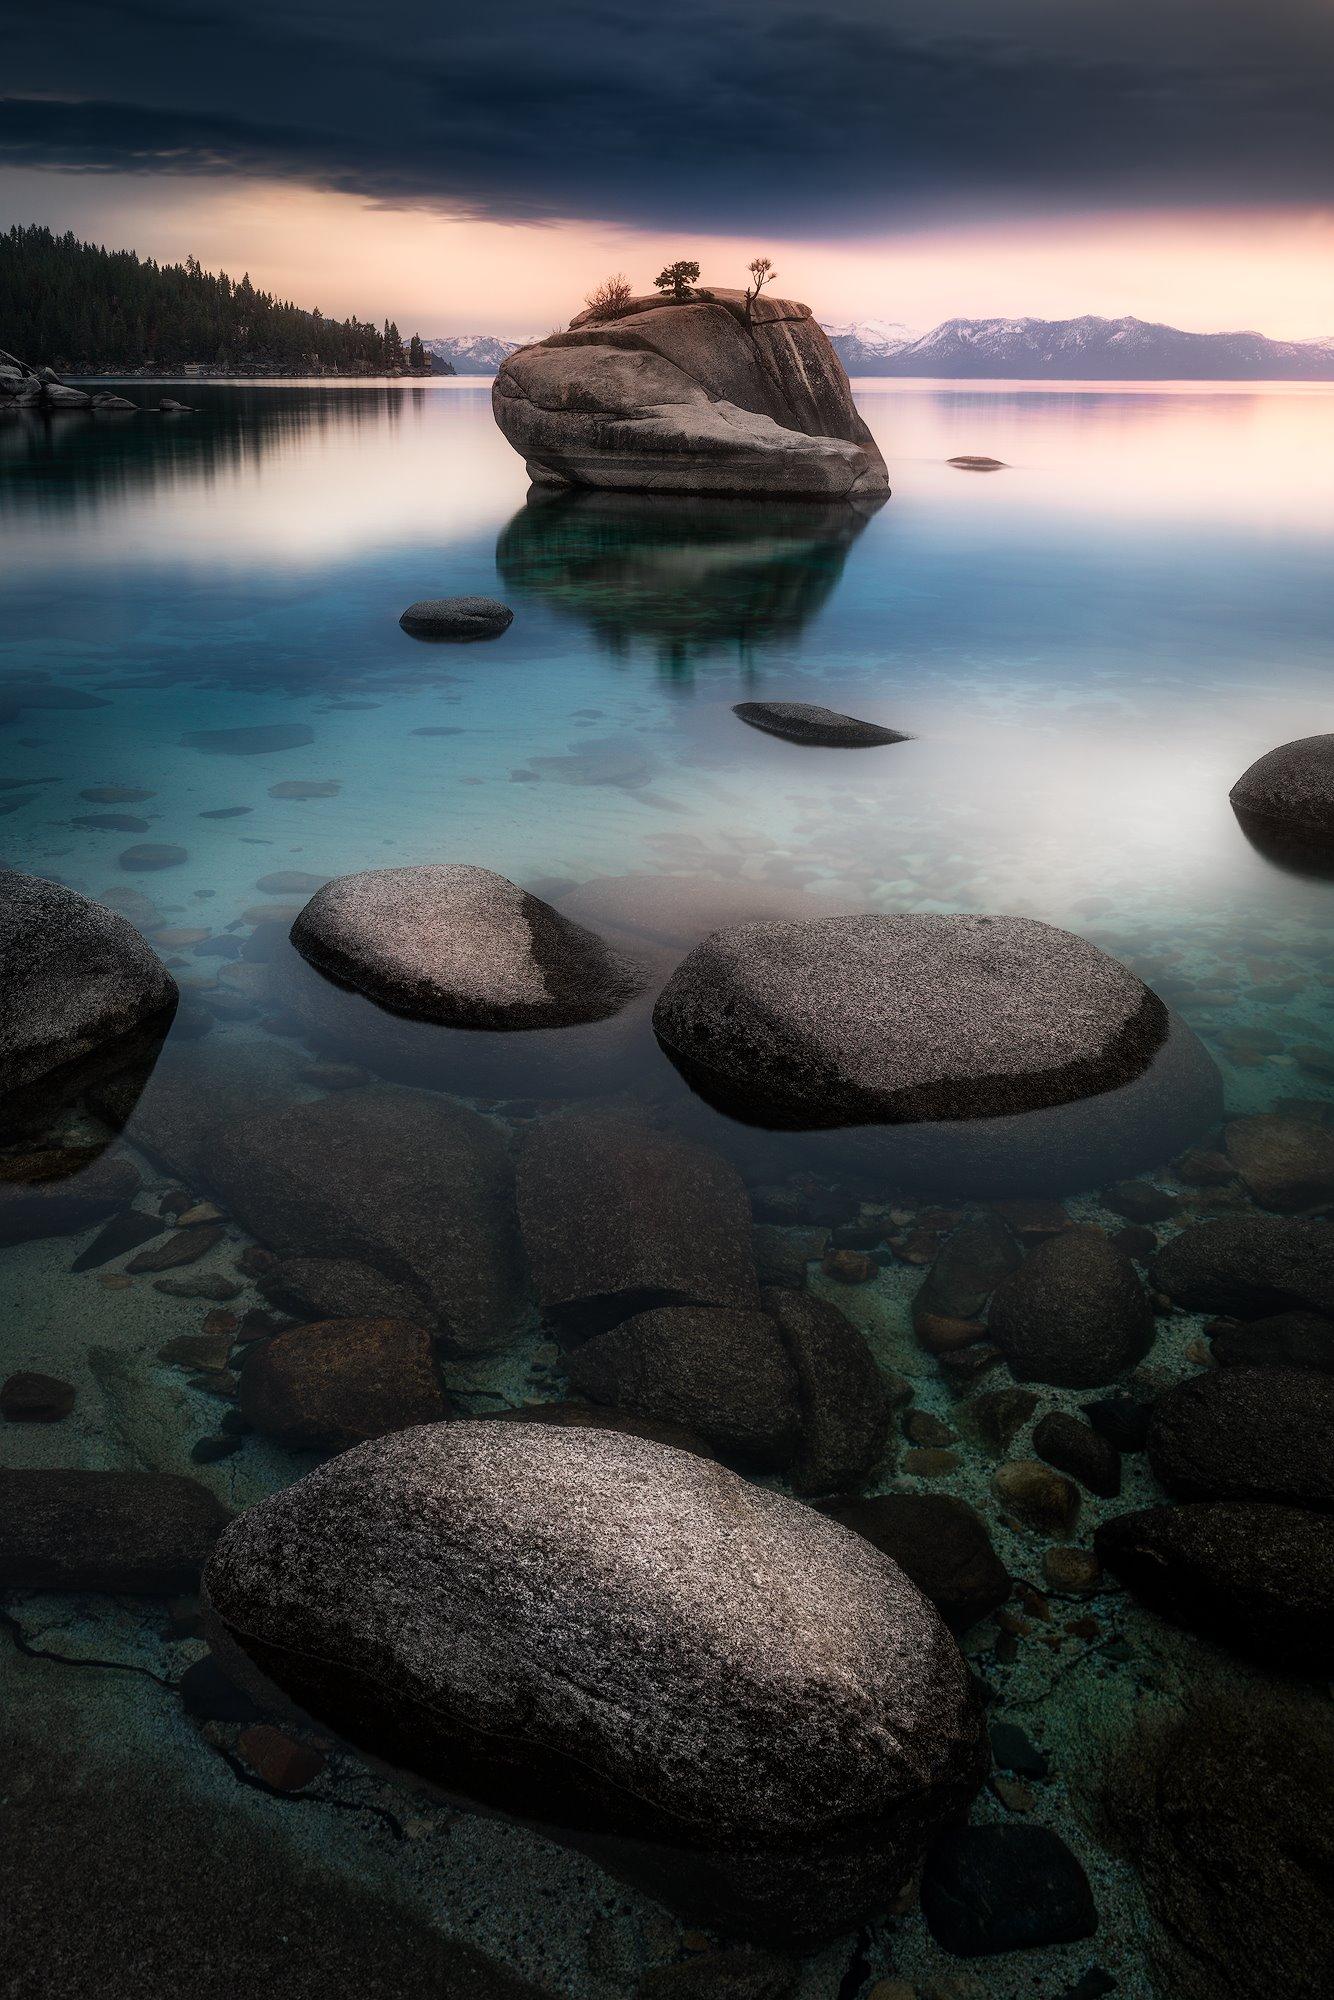 4 Images | Nikon Z7 | Nikon 14-24mm